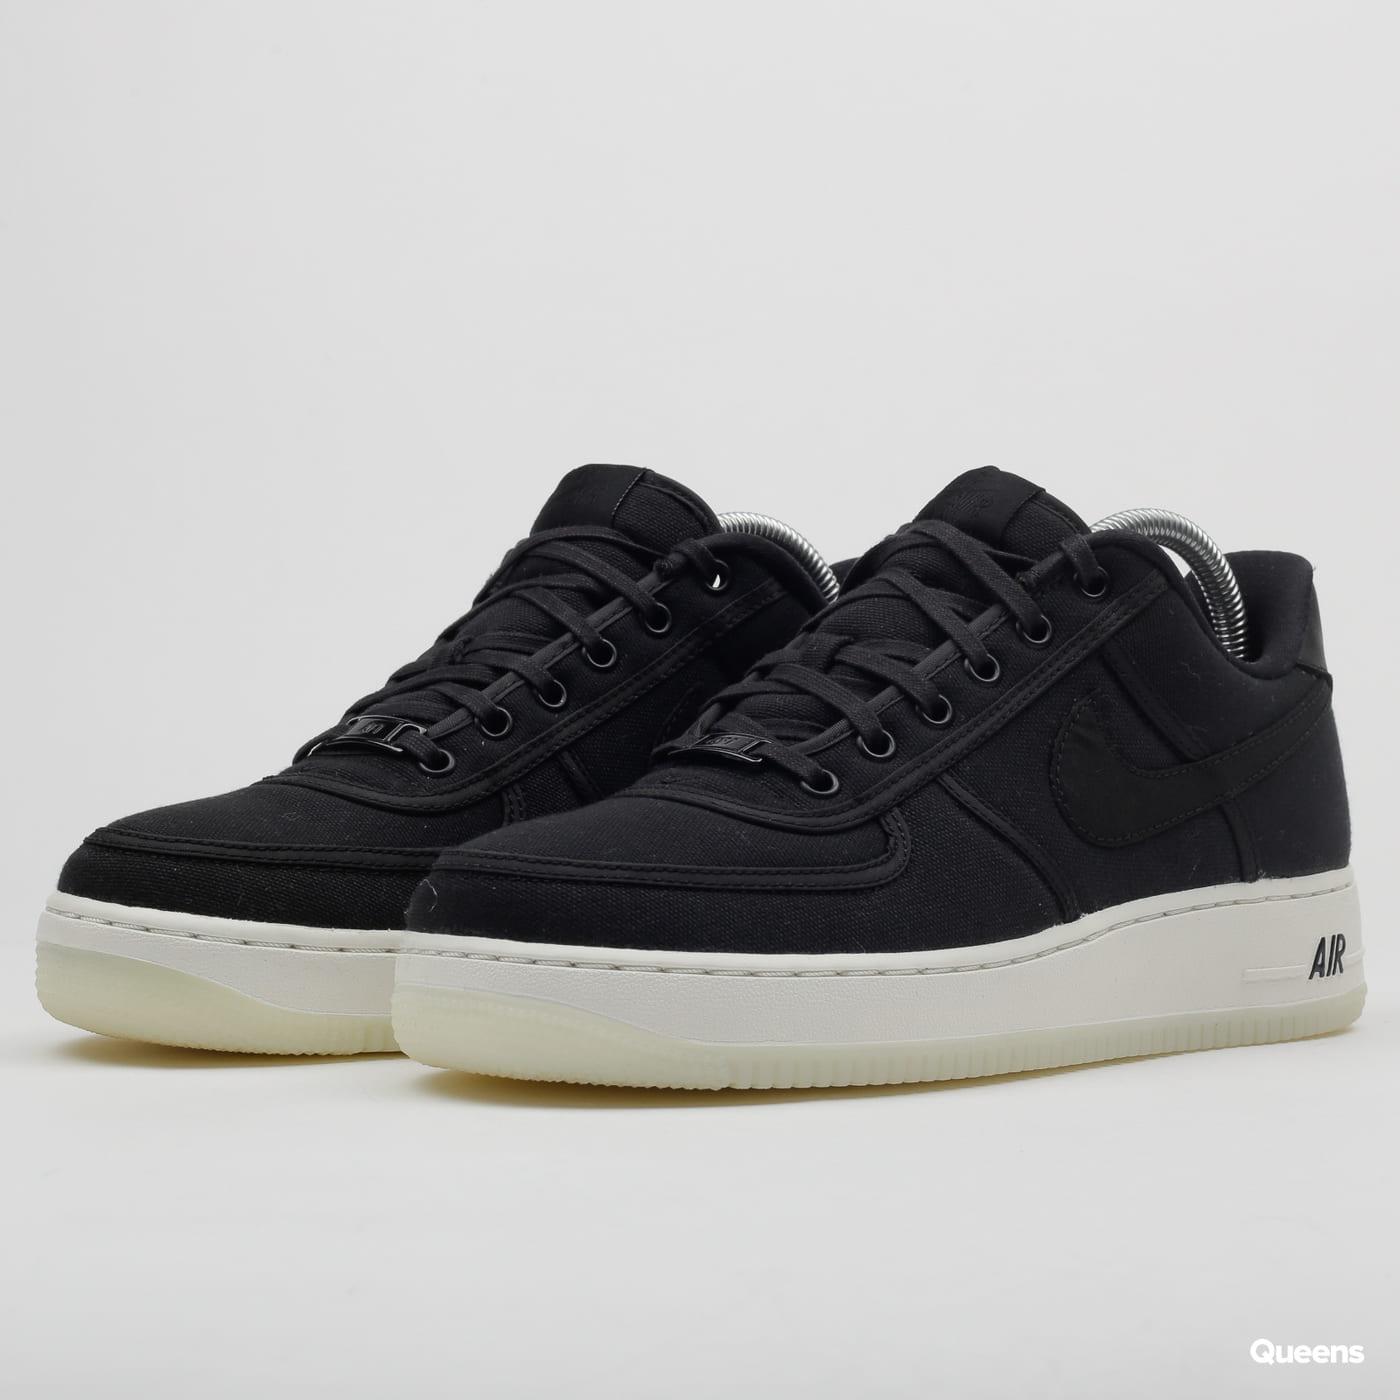 Nike Air Force 1 Low Retro QS Canvas black black summit white